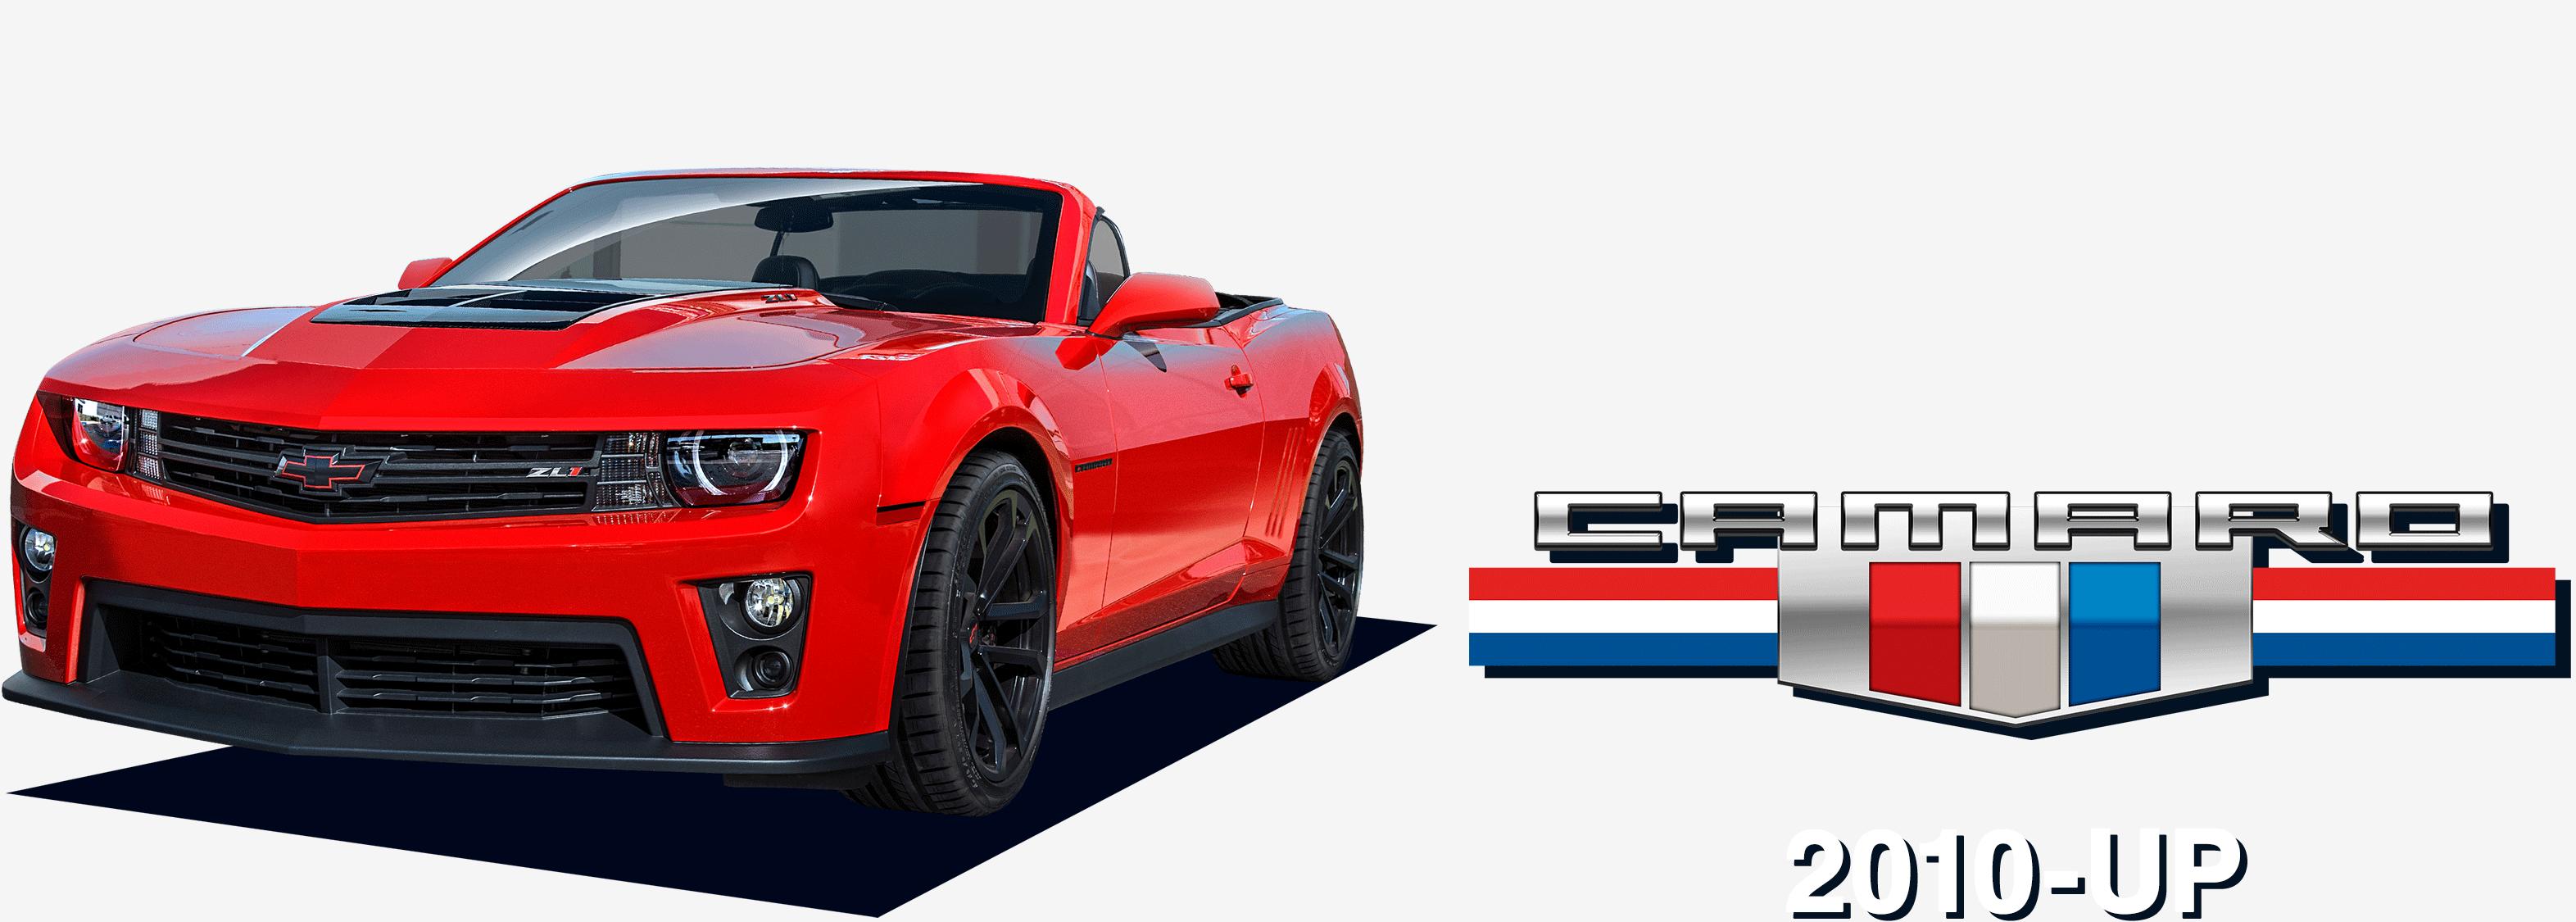 Camaro 2010-Up